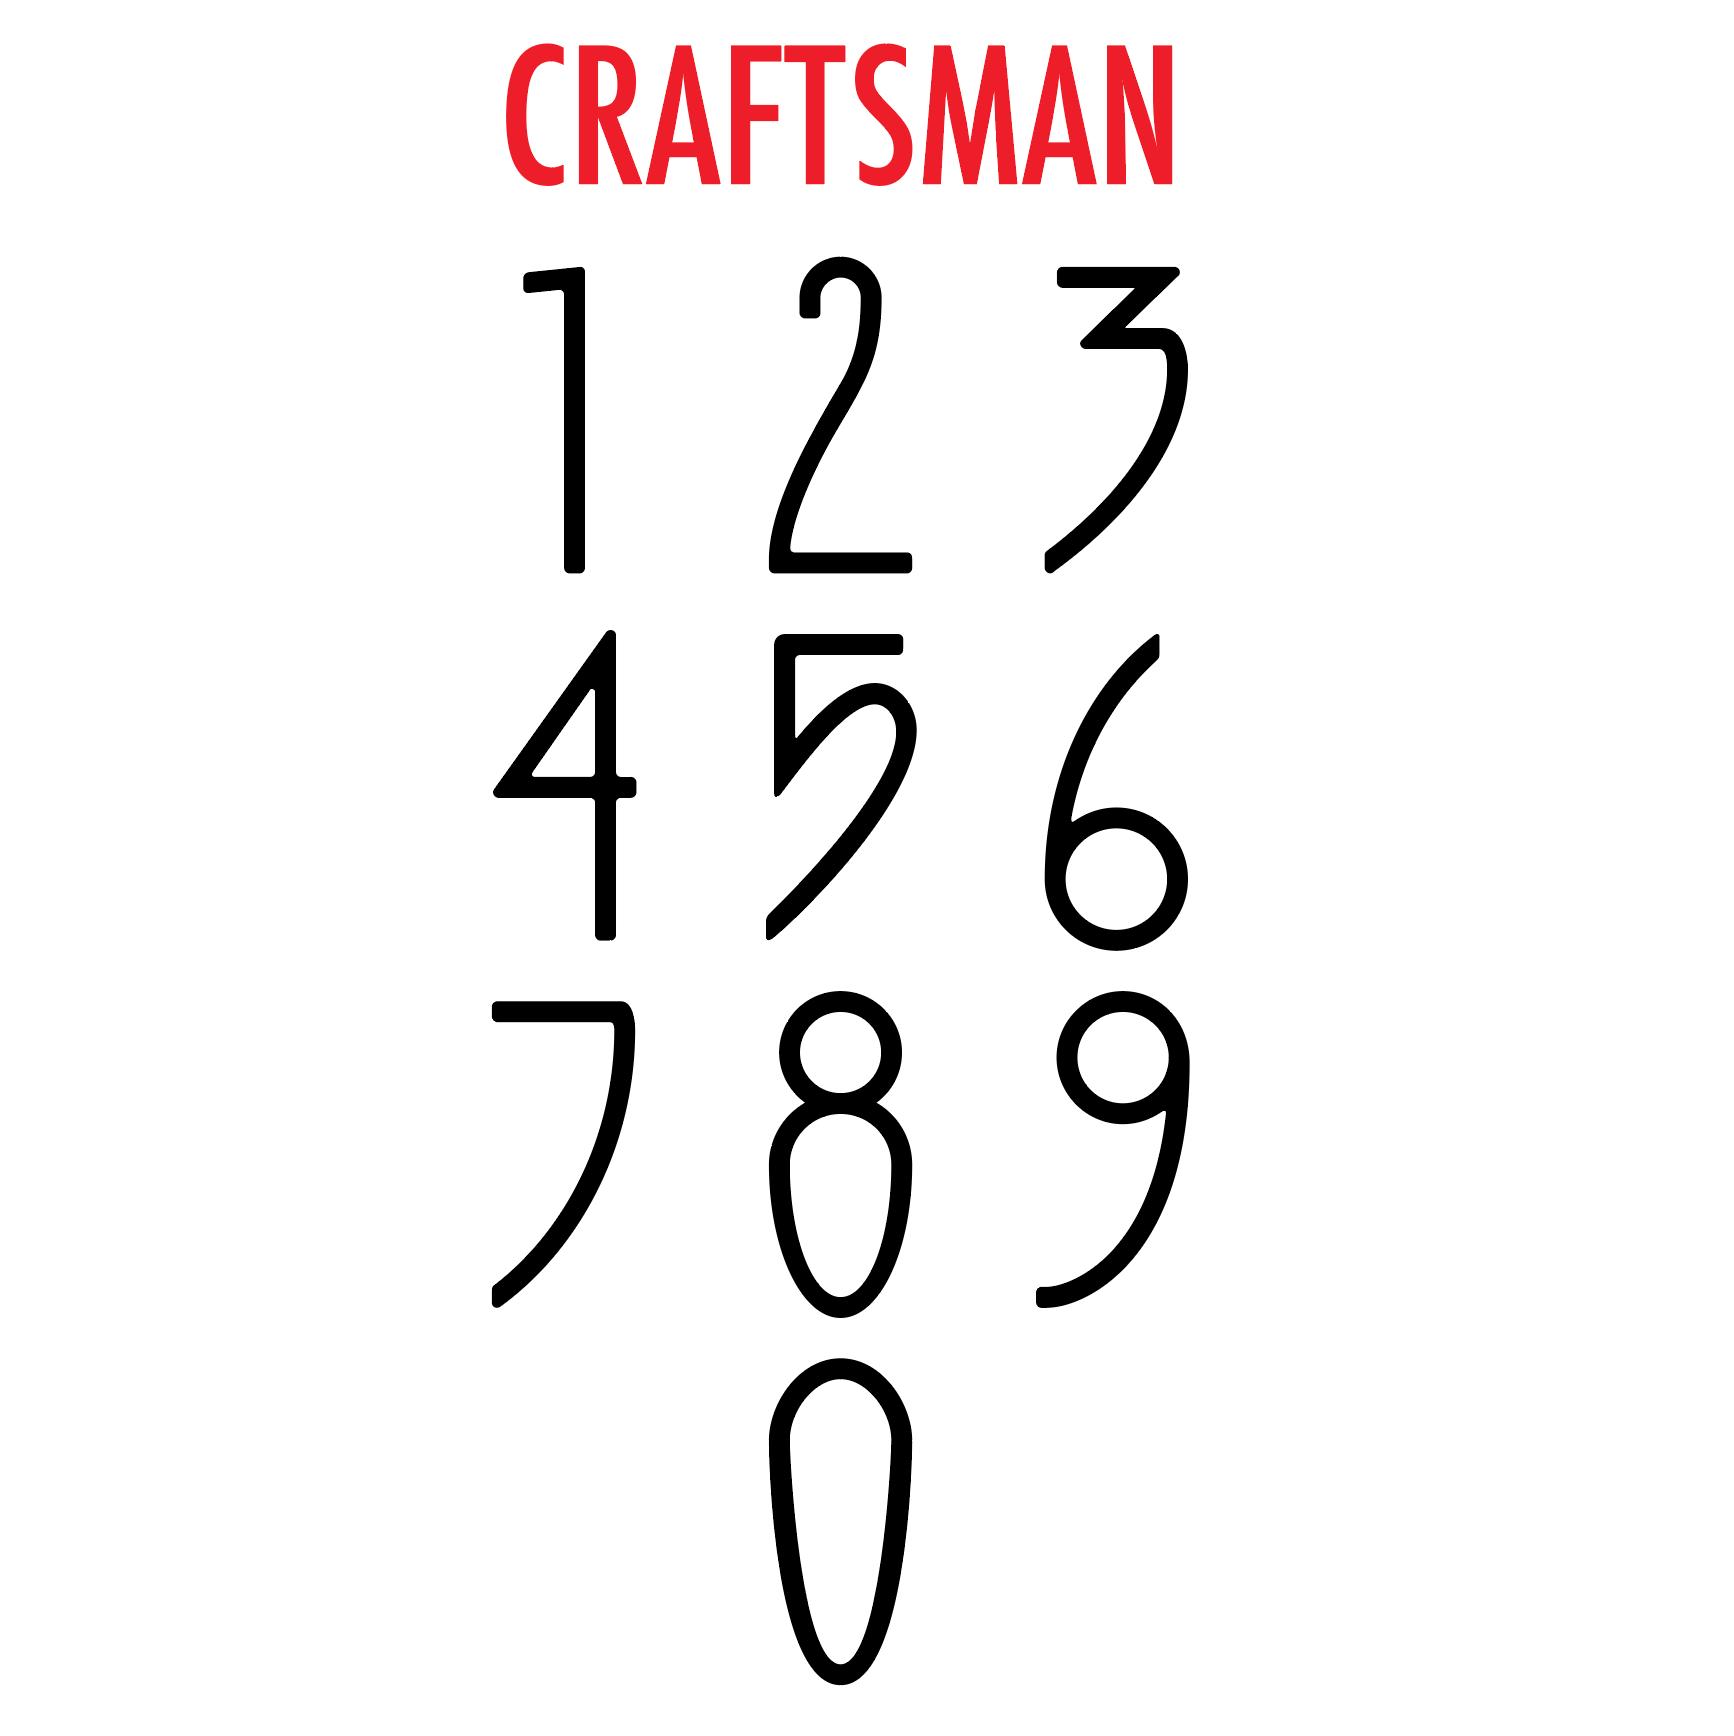 Craftsman Font